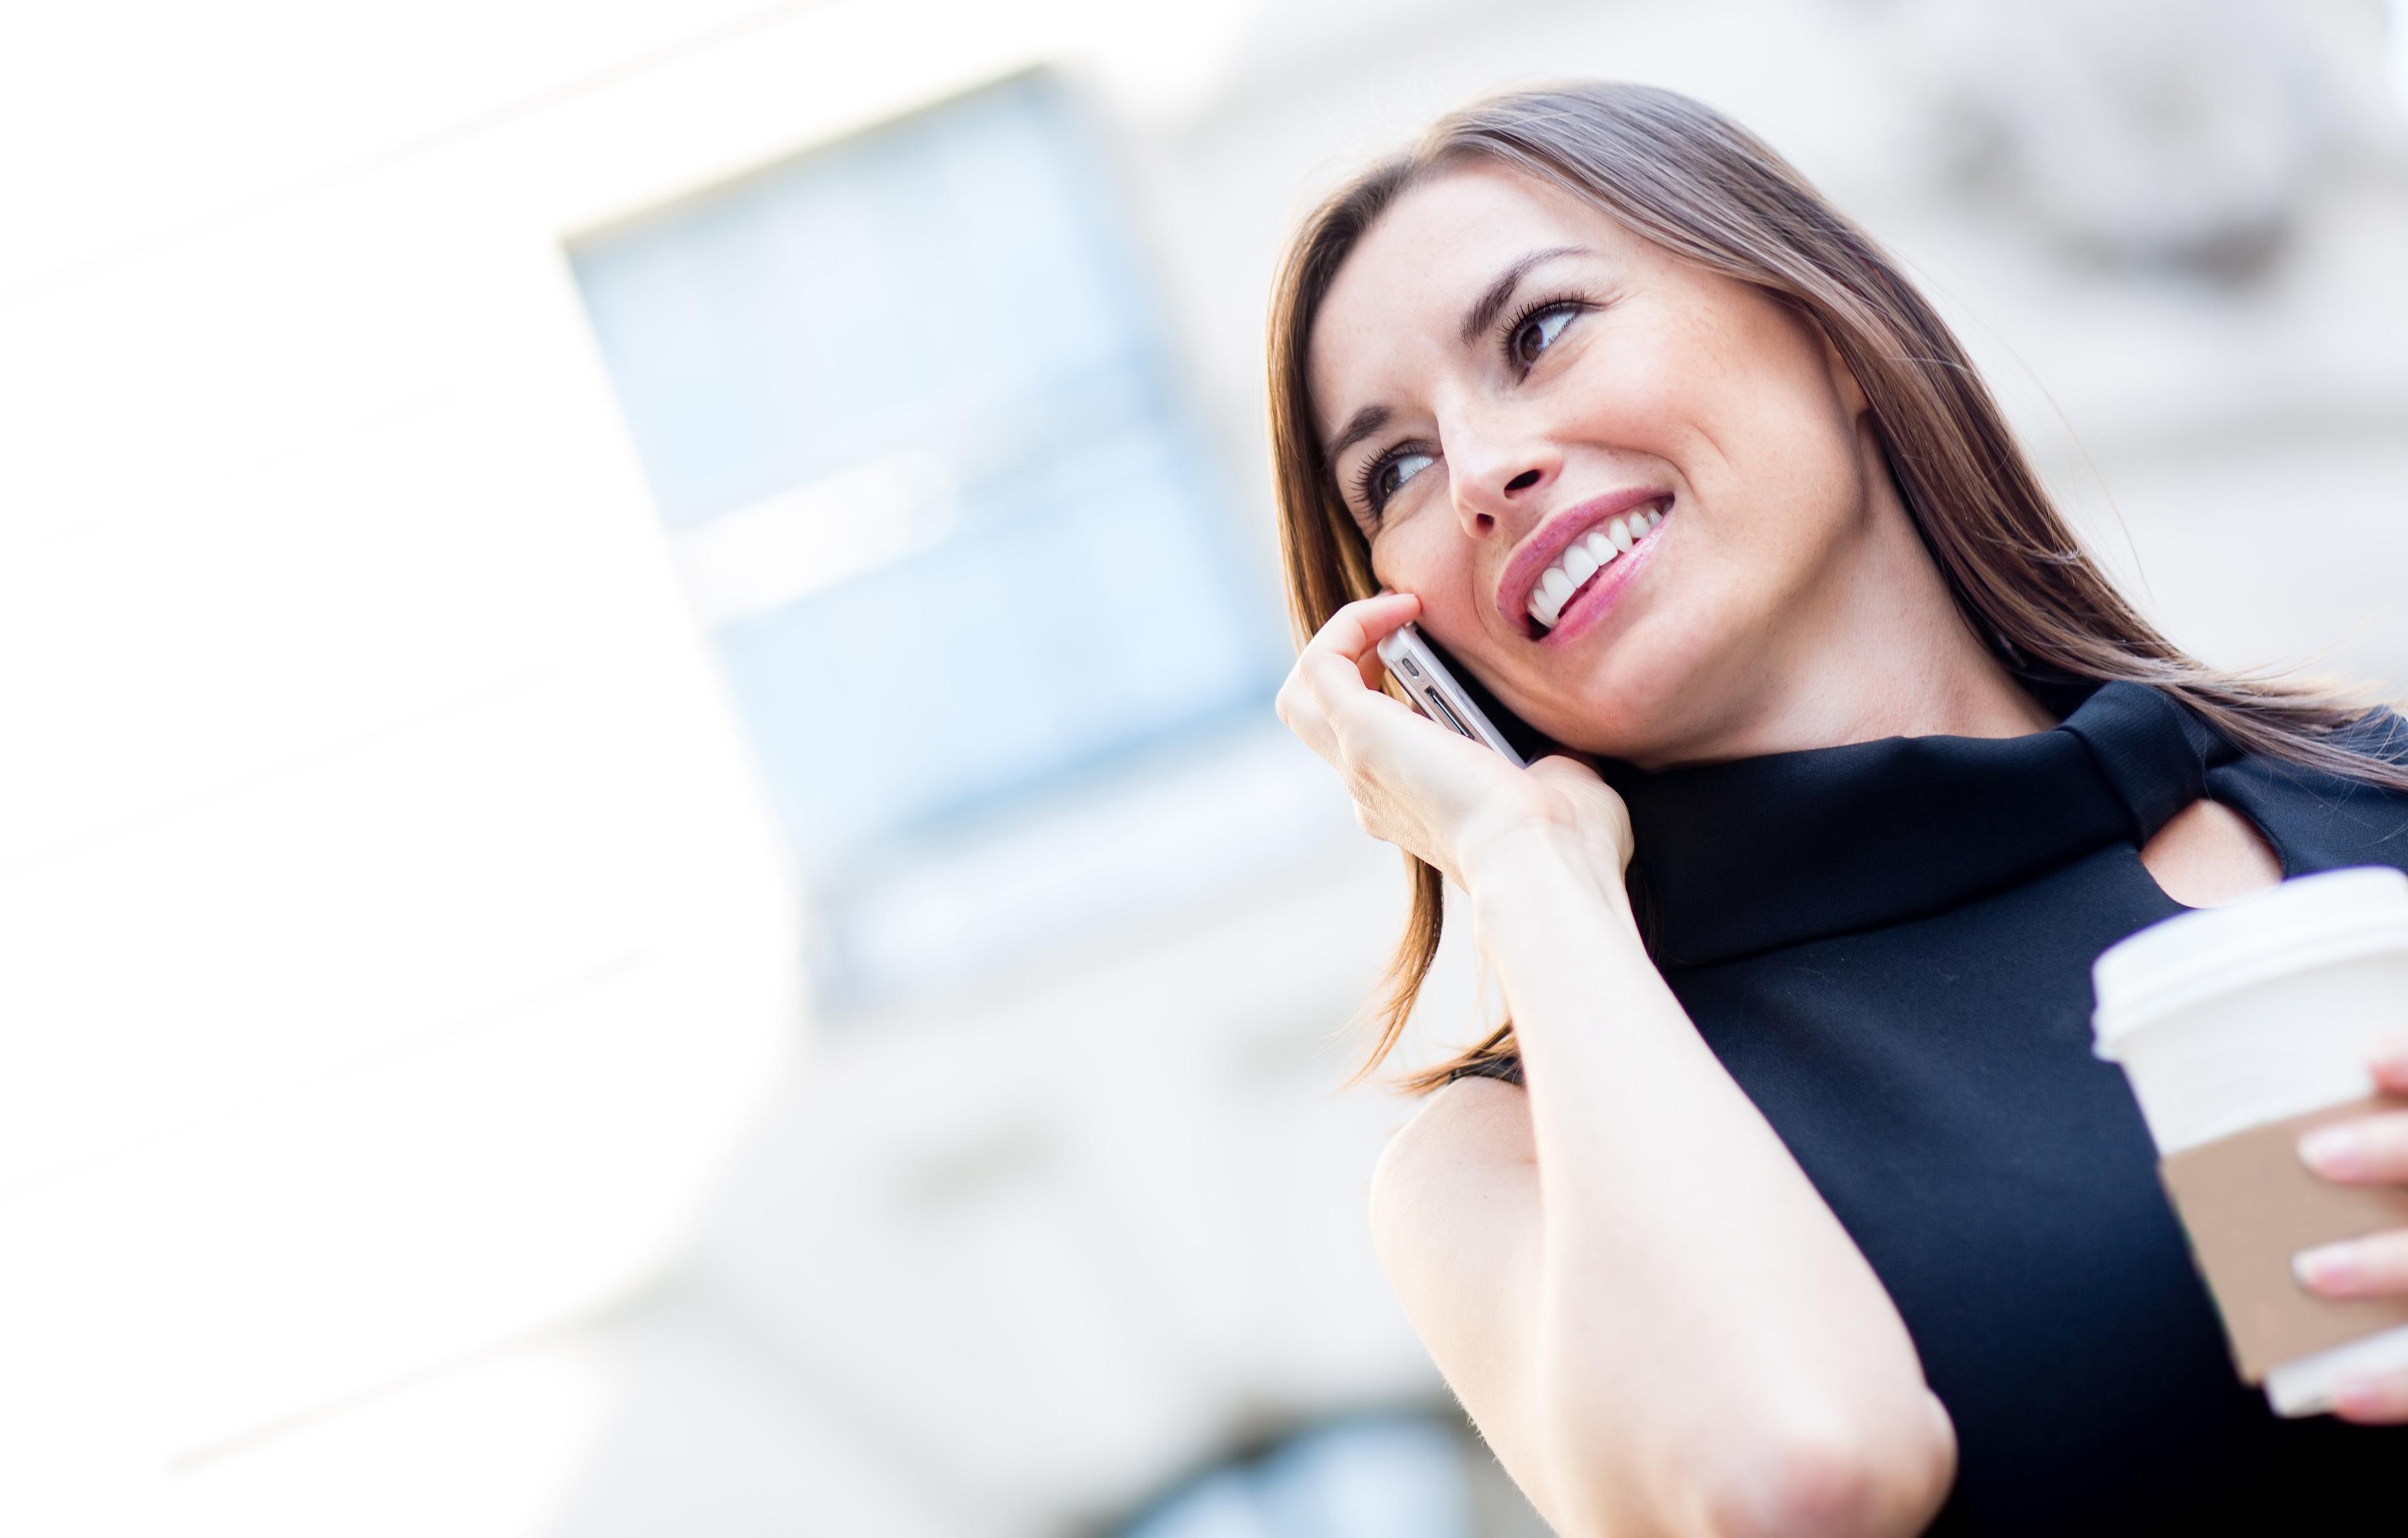 Rüyada Telefonla Aramak